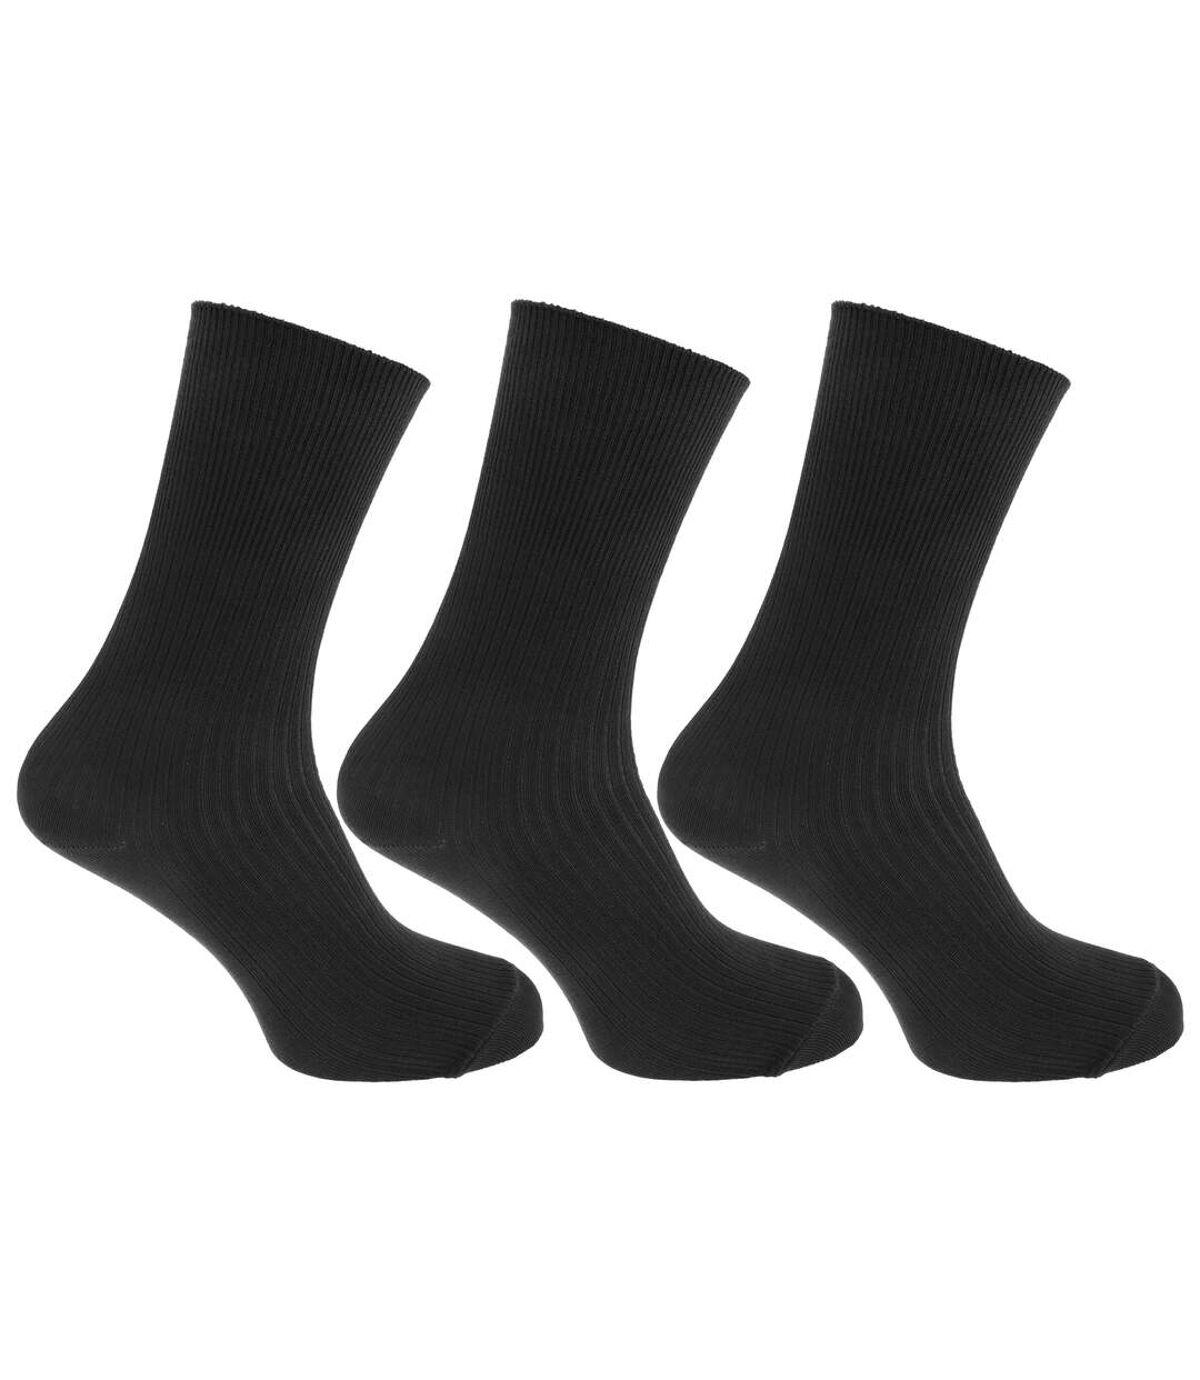 Mens Casual Non Elastic Bamboo Viscose Socks (Pack Of 3) (Black) - UTMB376